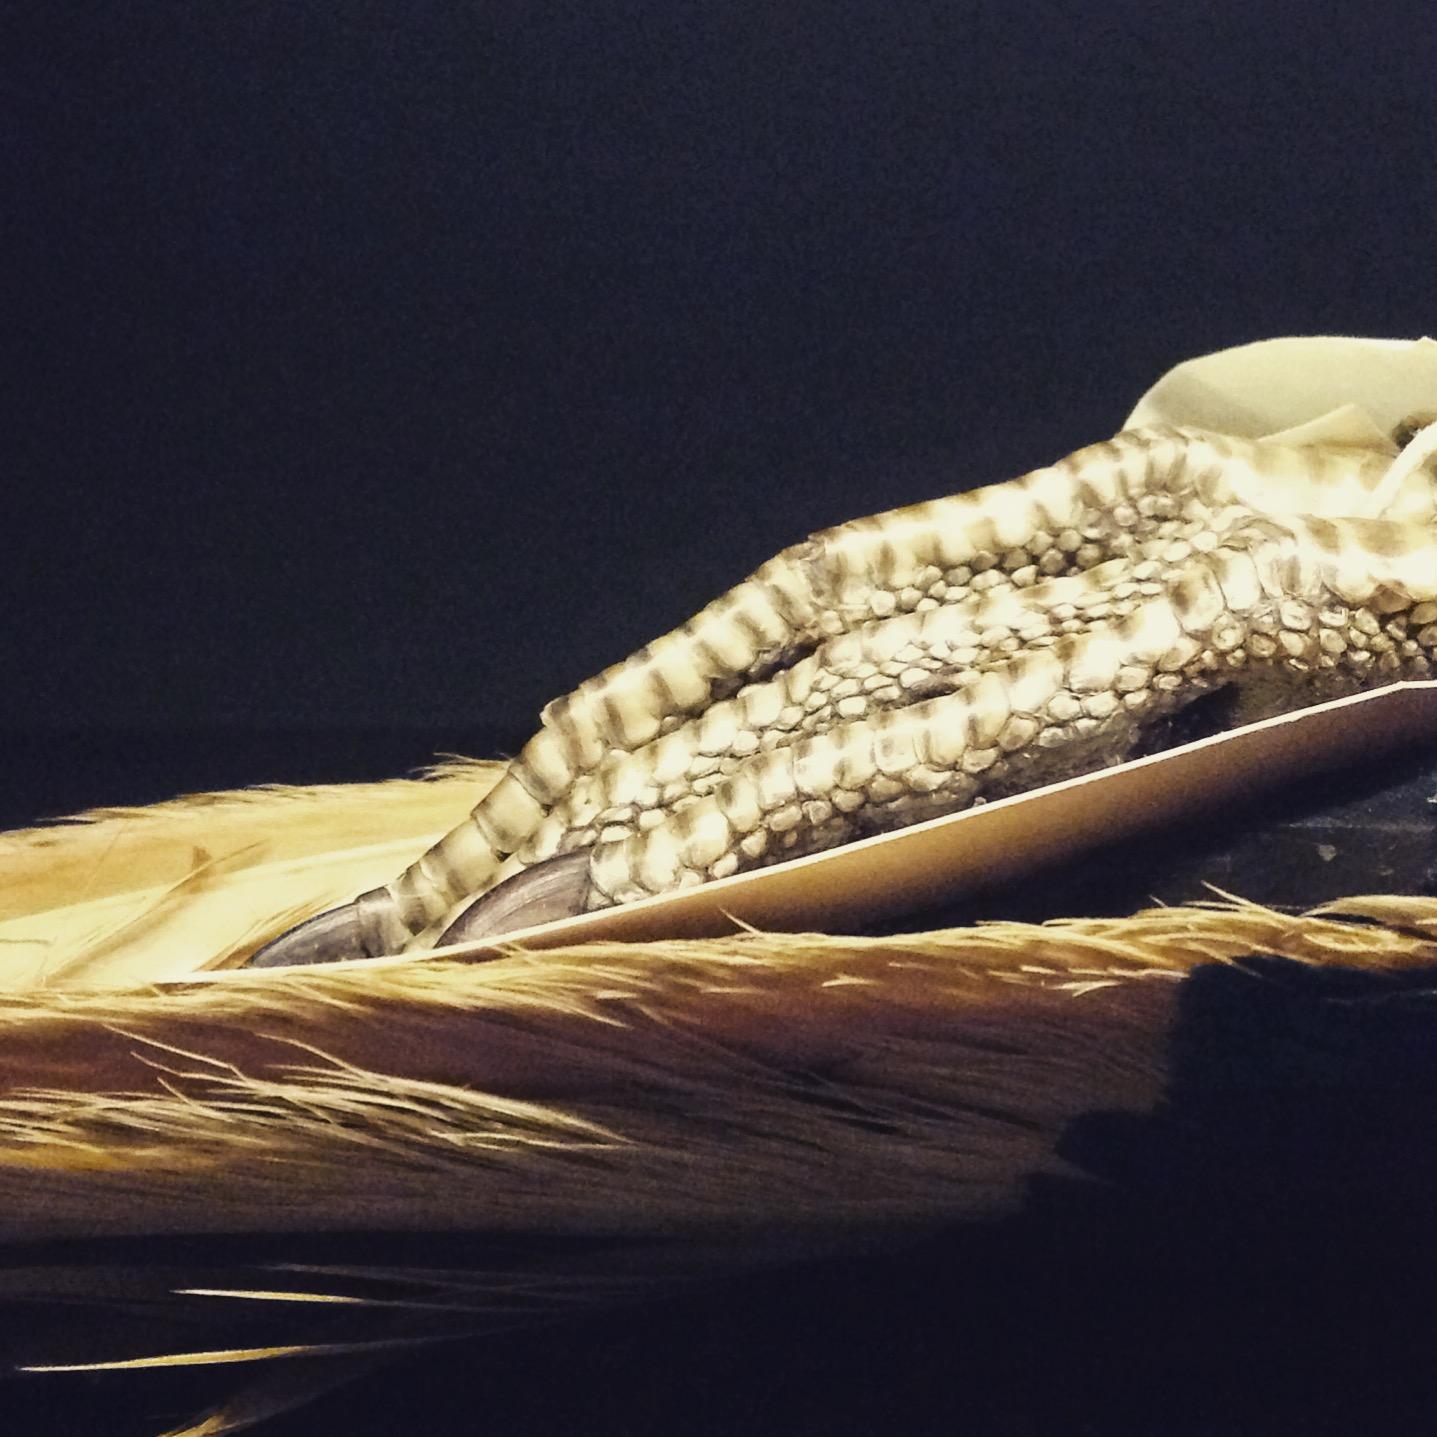 close up birds feet. Photo by Lindsay McDonagh